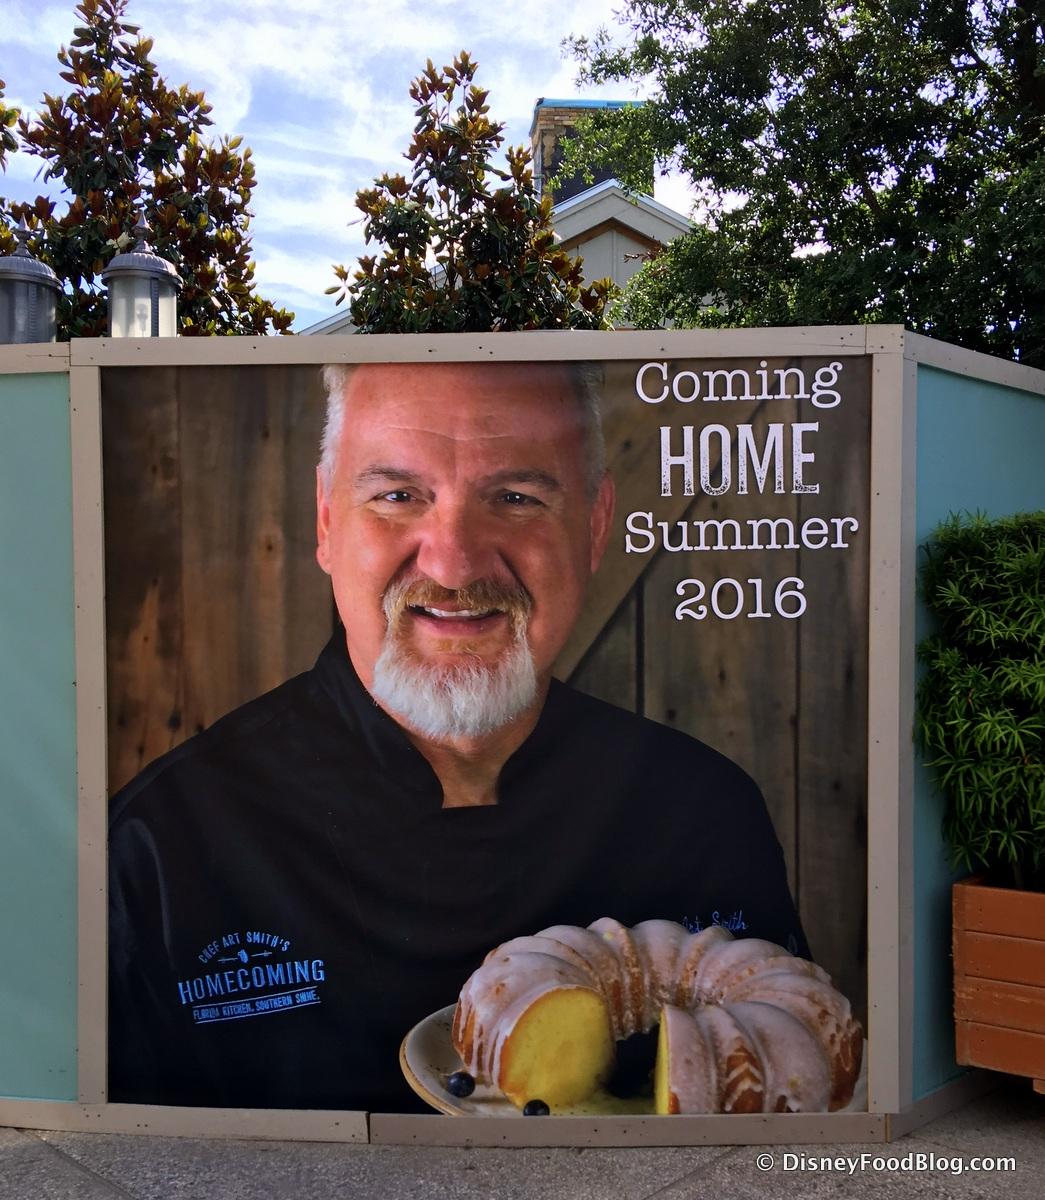 Menu Sneak Peek For Homecoming: Florida Kitchen And